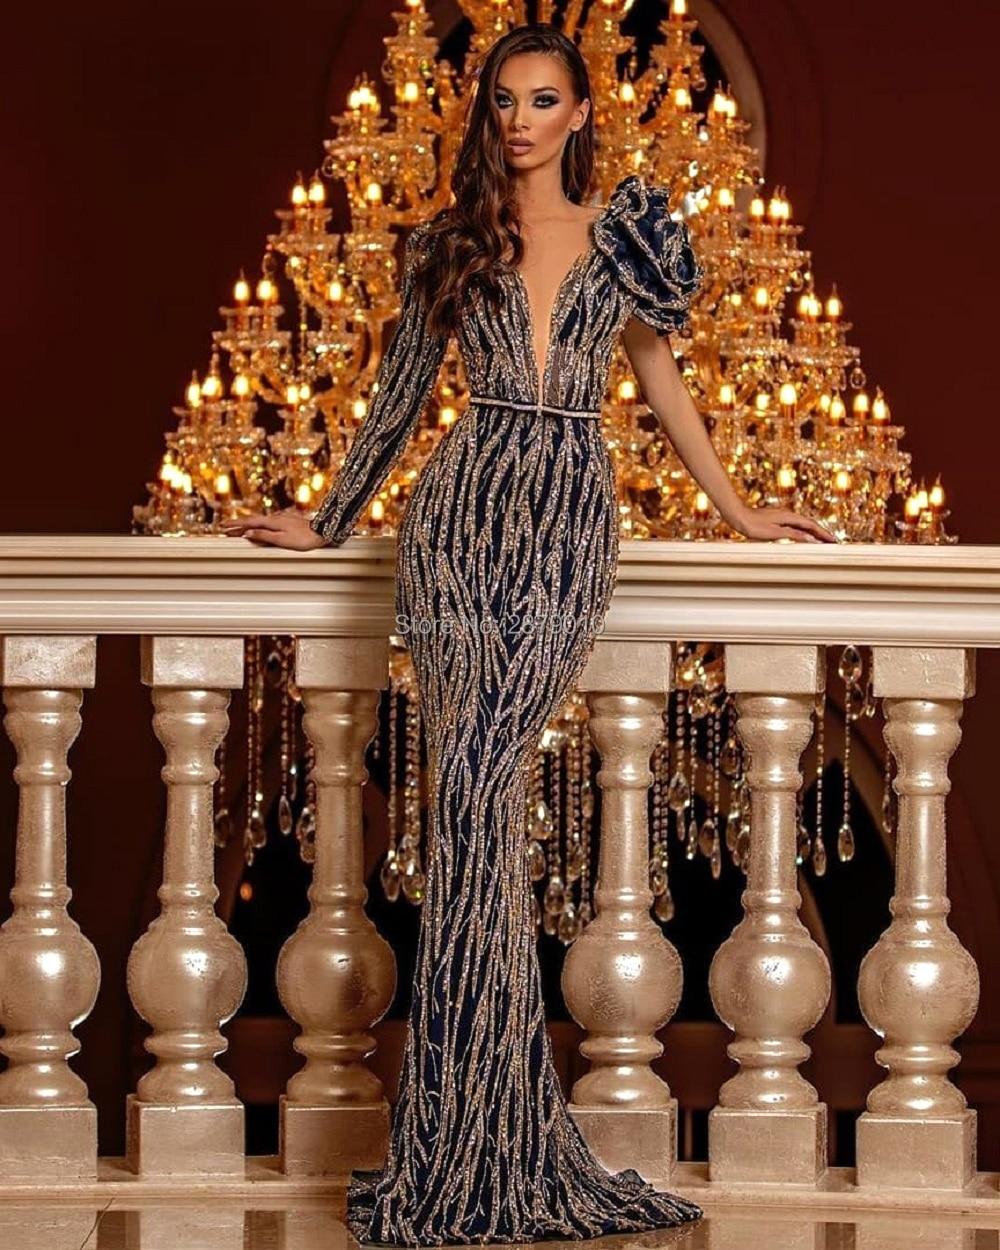 Image 3 - Haute Couture V Neck Mermaid Evening Dress Removable Skirt Floor Length Beaded Sequins Celebrity Dress Robe De Soiree Aibye 2020Evening Dresses   -